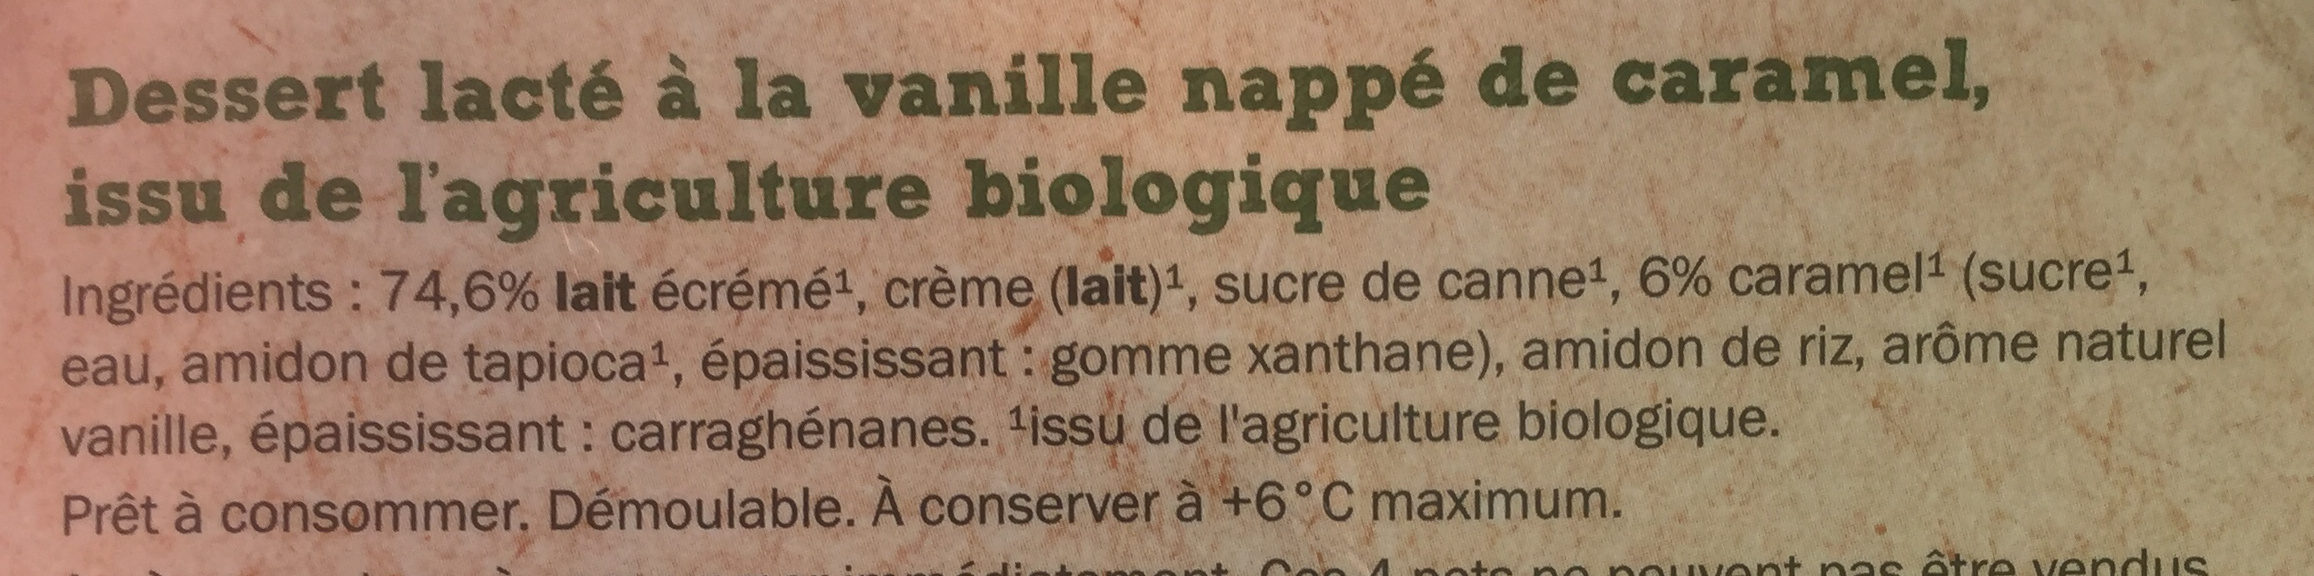 Flan Vanille Nappé Caramel - Ingrédients - fr